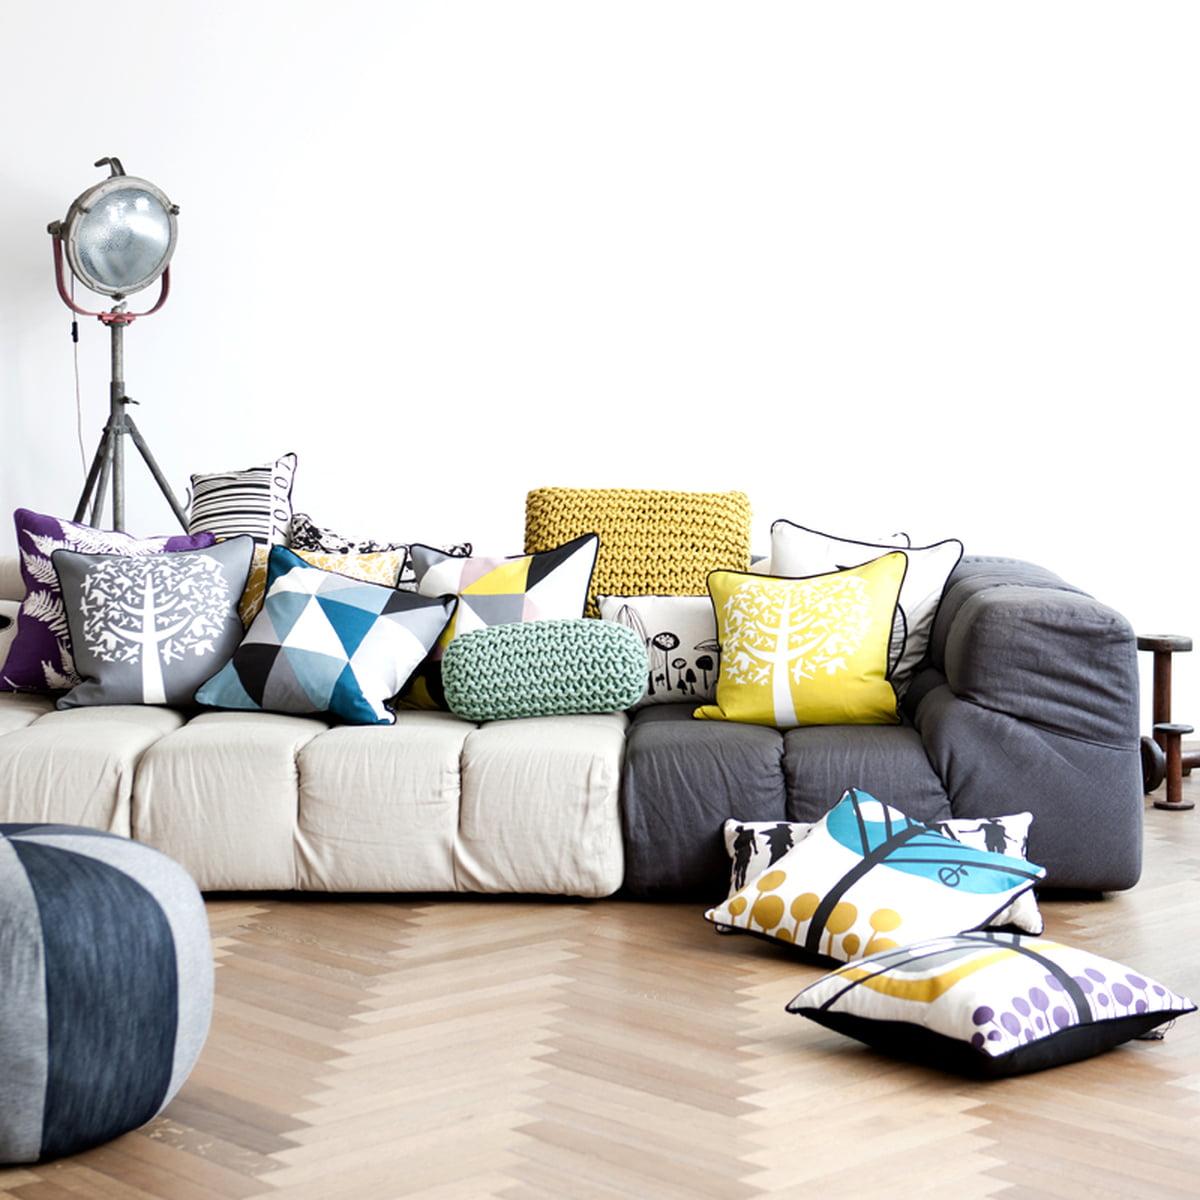 remix kissen von ferm living im shop. Black Bedroom Furniture Sets. Home Design Ideas